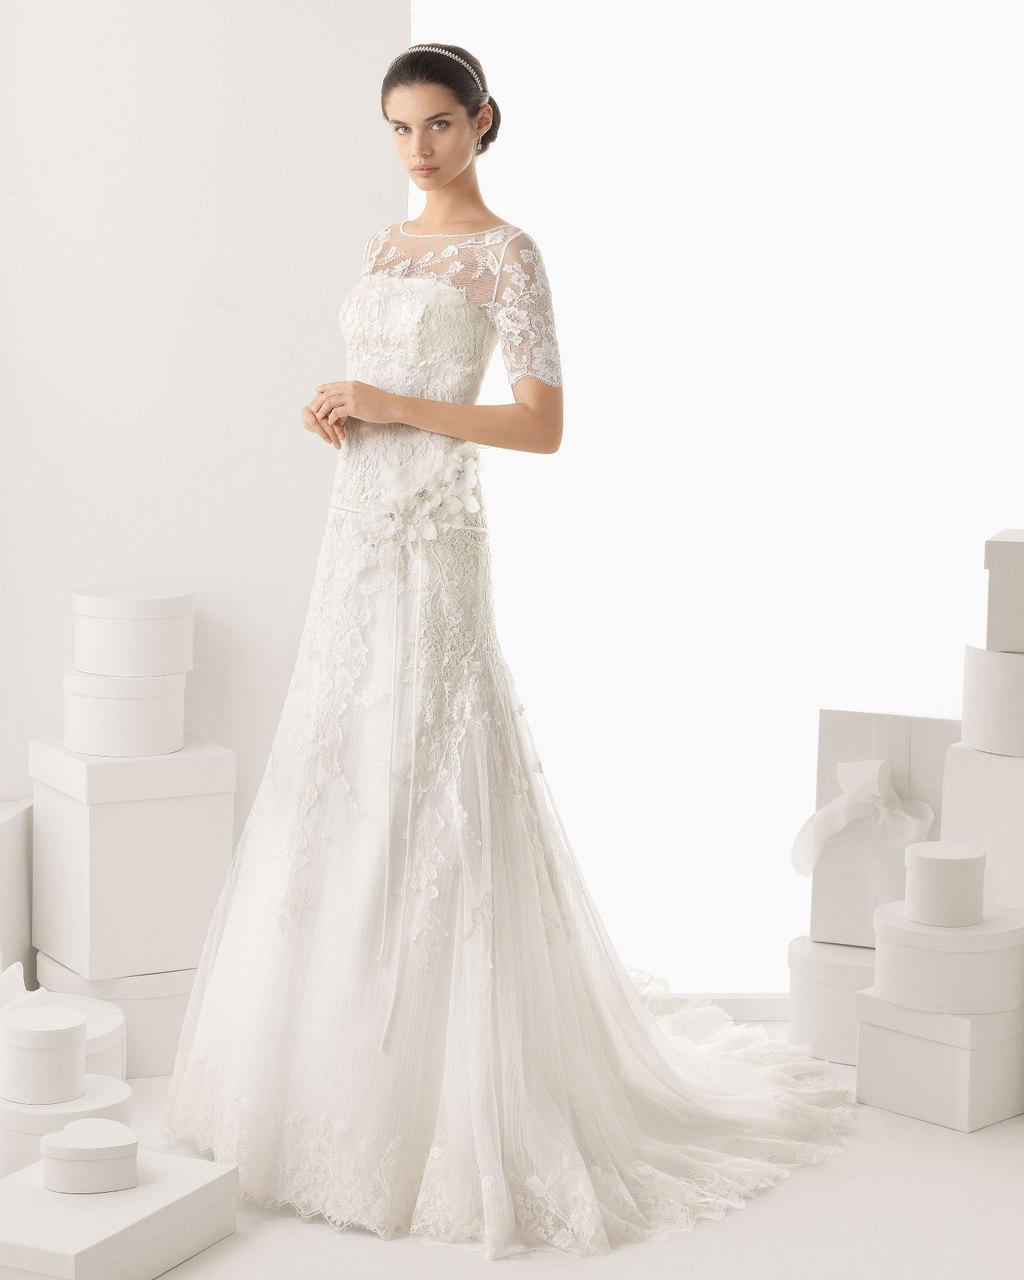 Rosa-clara-wedding-dress-2014-bridal-canarias.full